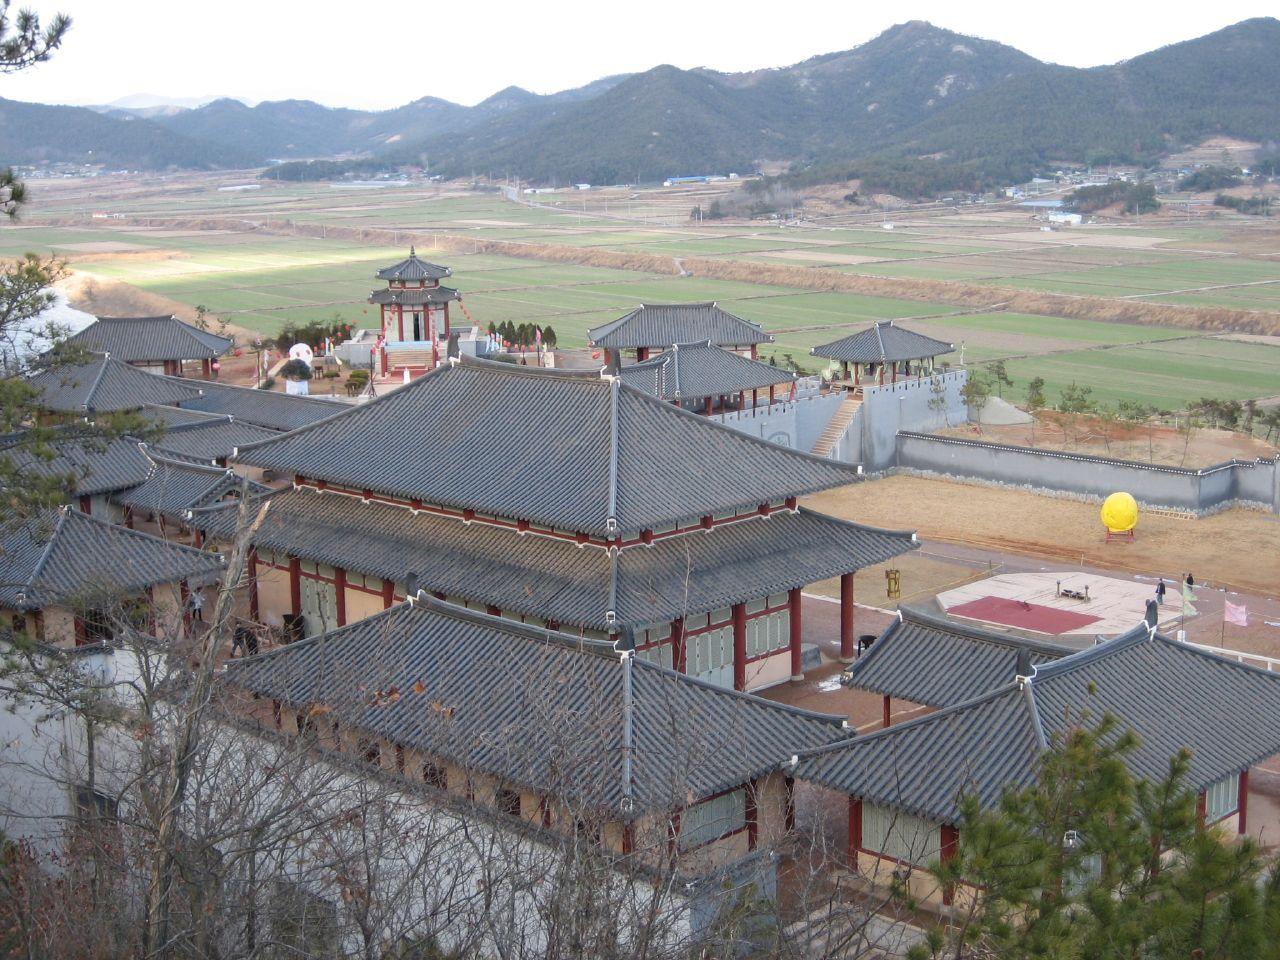 Yongin MBC Dramia - South Korea Filming Location